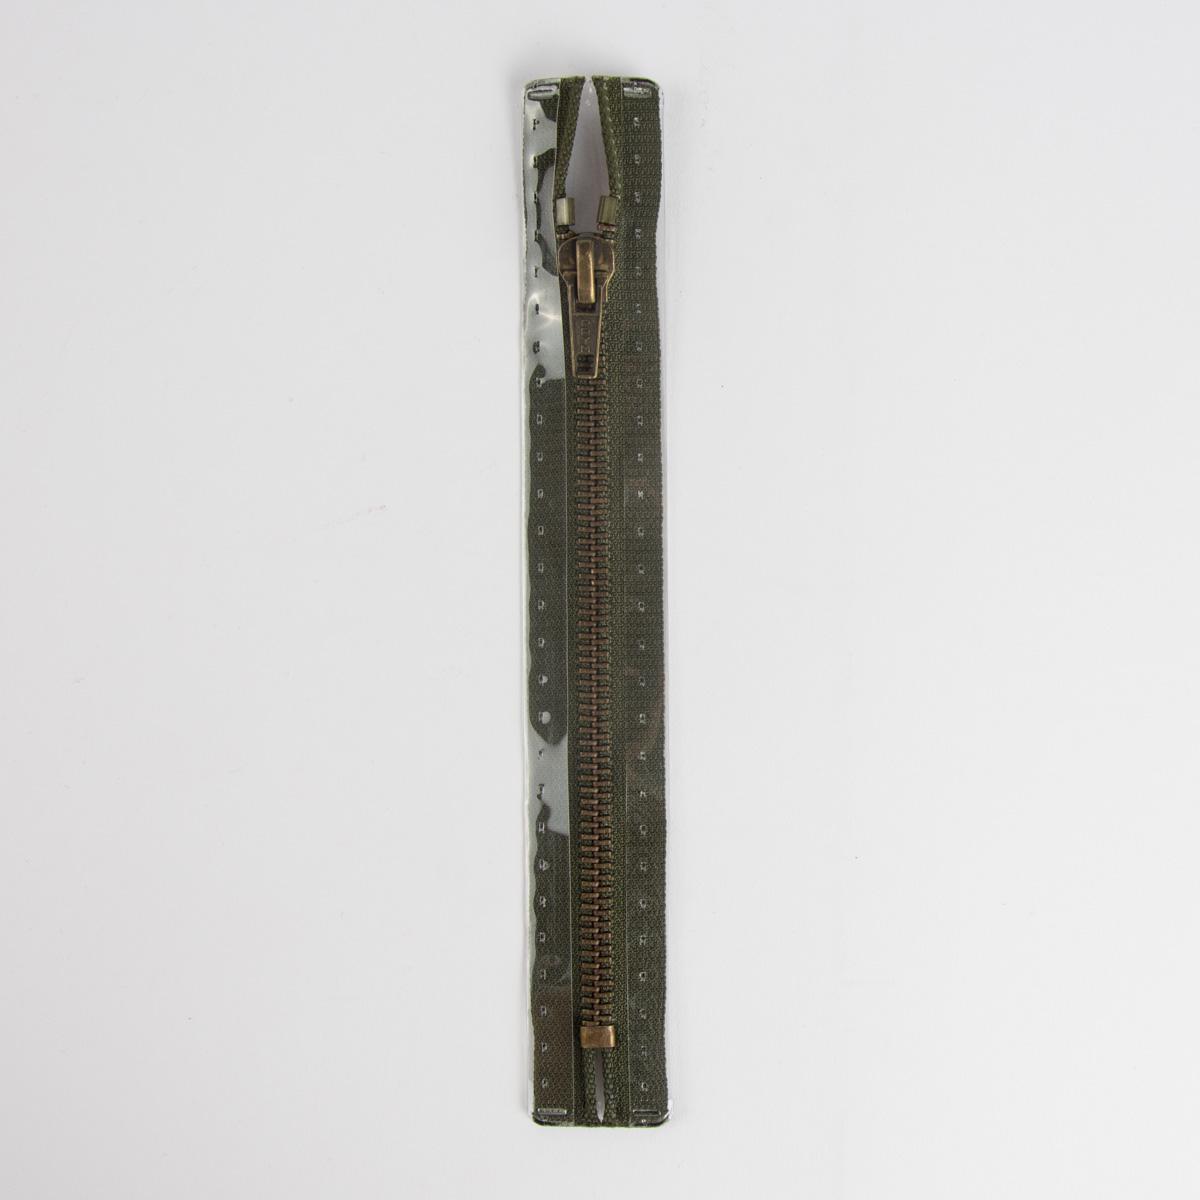 Reißverschluss M6 Typ 10 ut 14 cm am-fb Fla br-oliv